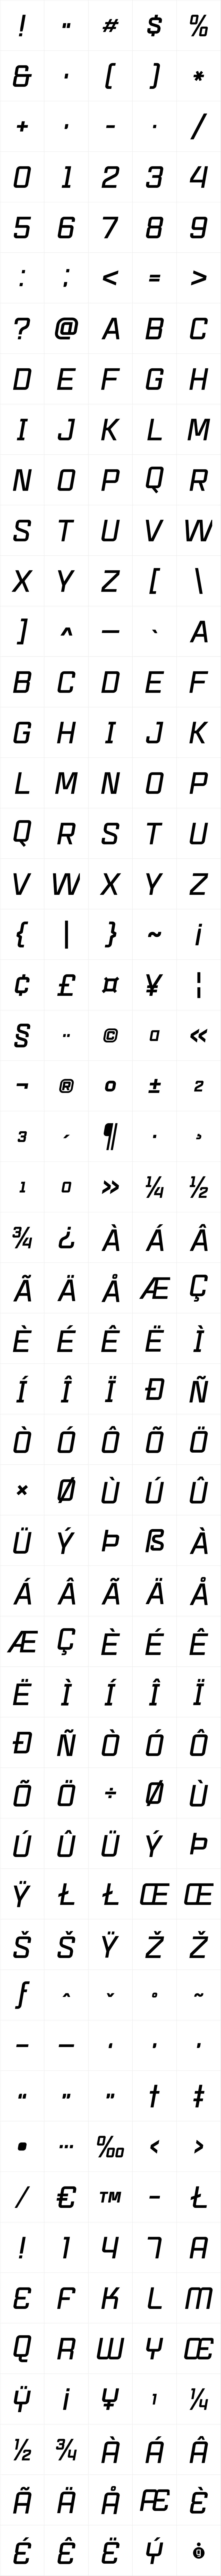 Mensura Titling 1 Italic